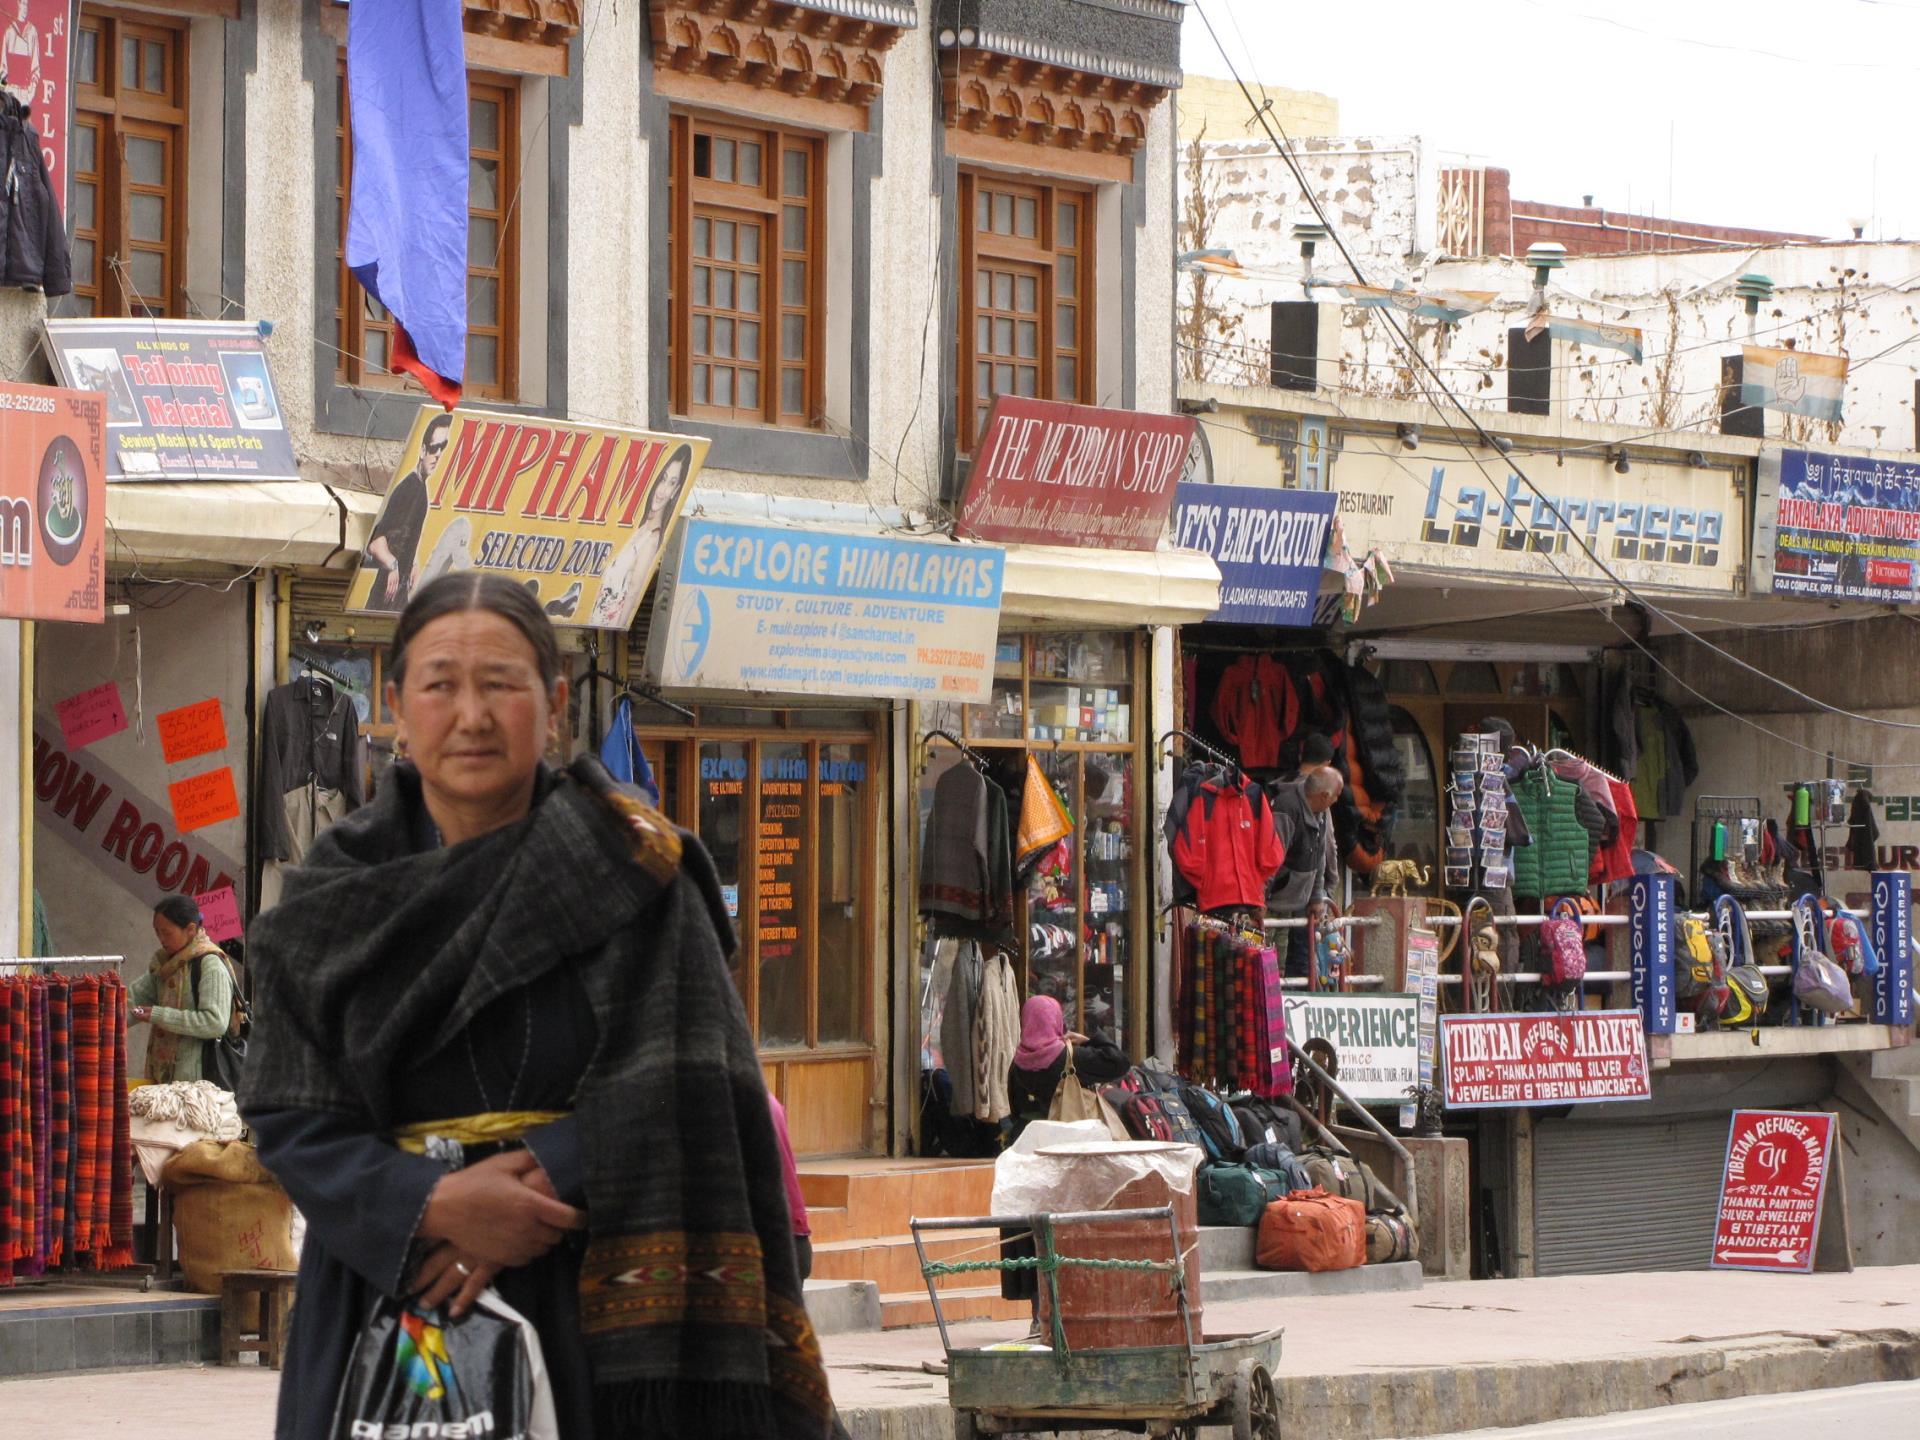 Laddakh the Dreamland with Taj Mahal Tour 6